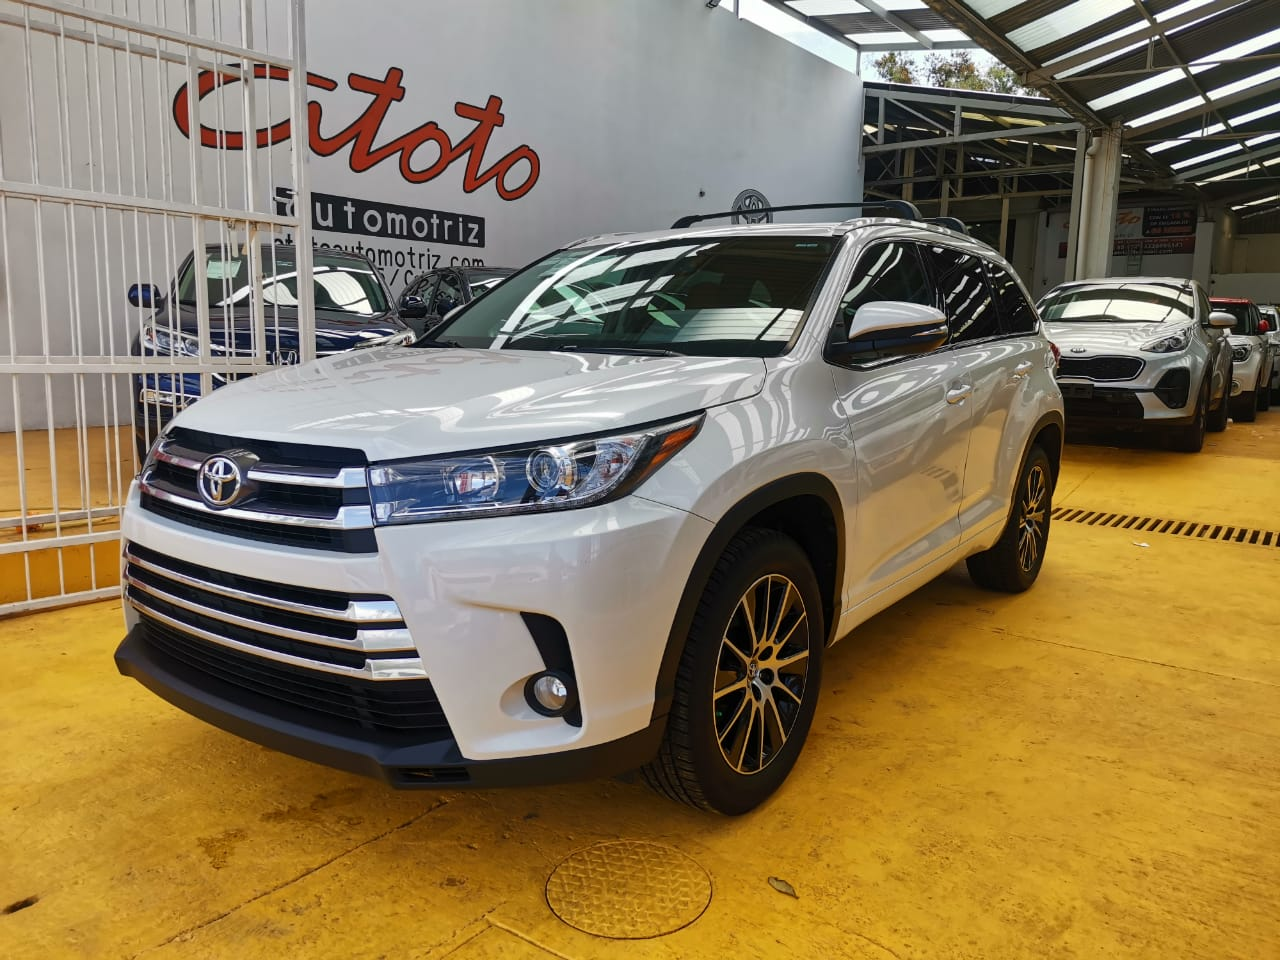 Toyota highlander 2017 limited